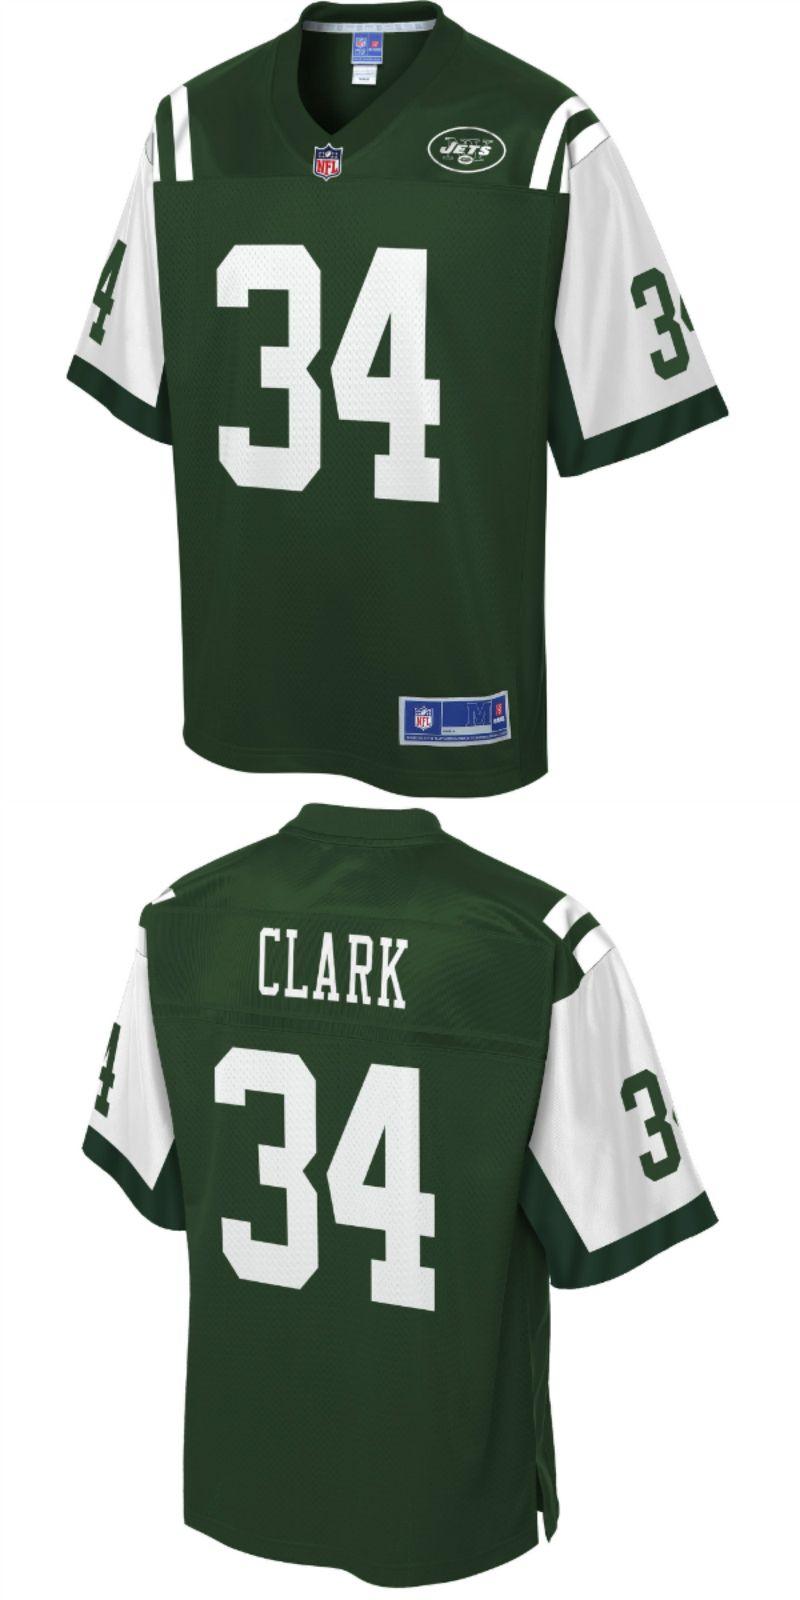 huge selection of f40eb 4a6b7 Jeremy Clark New York Jets NFL Pro Line Team Color Player ...